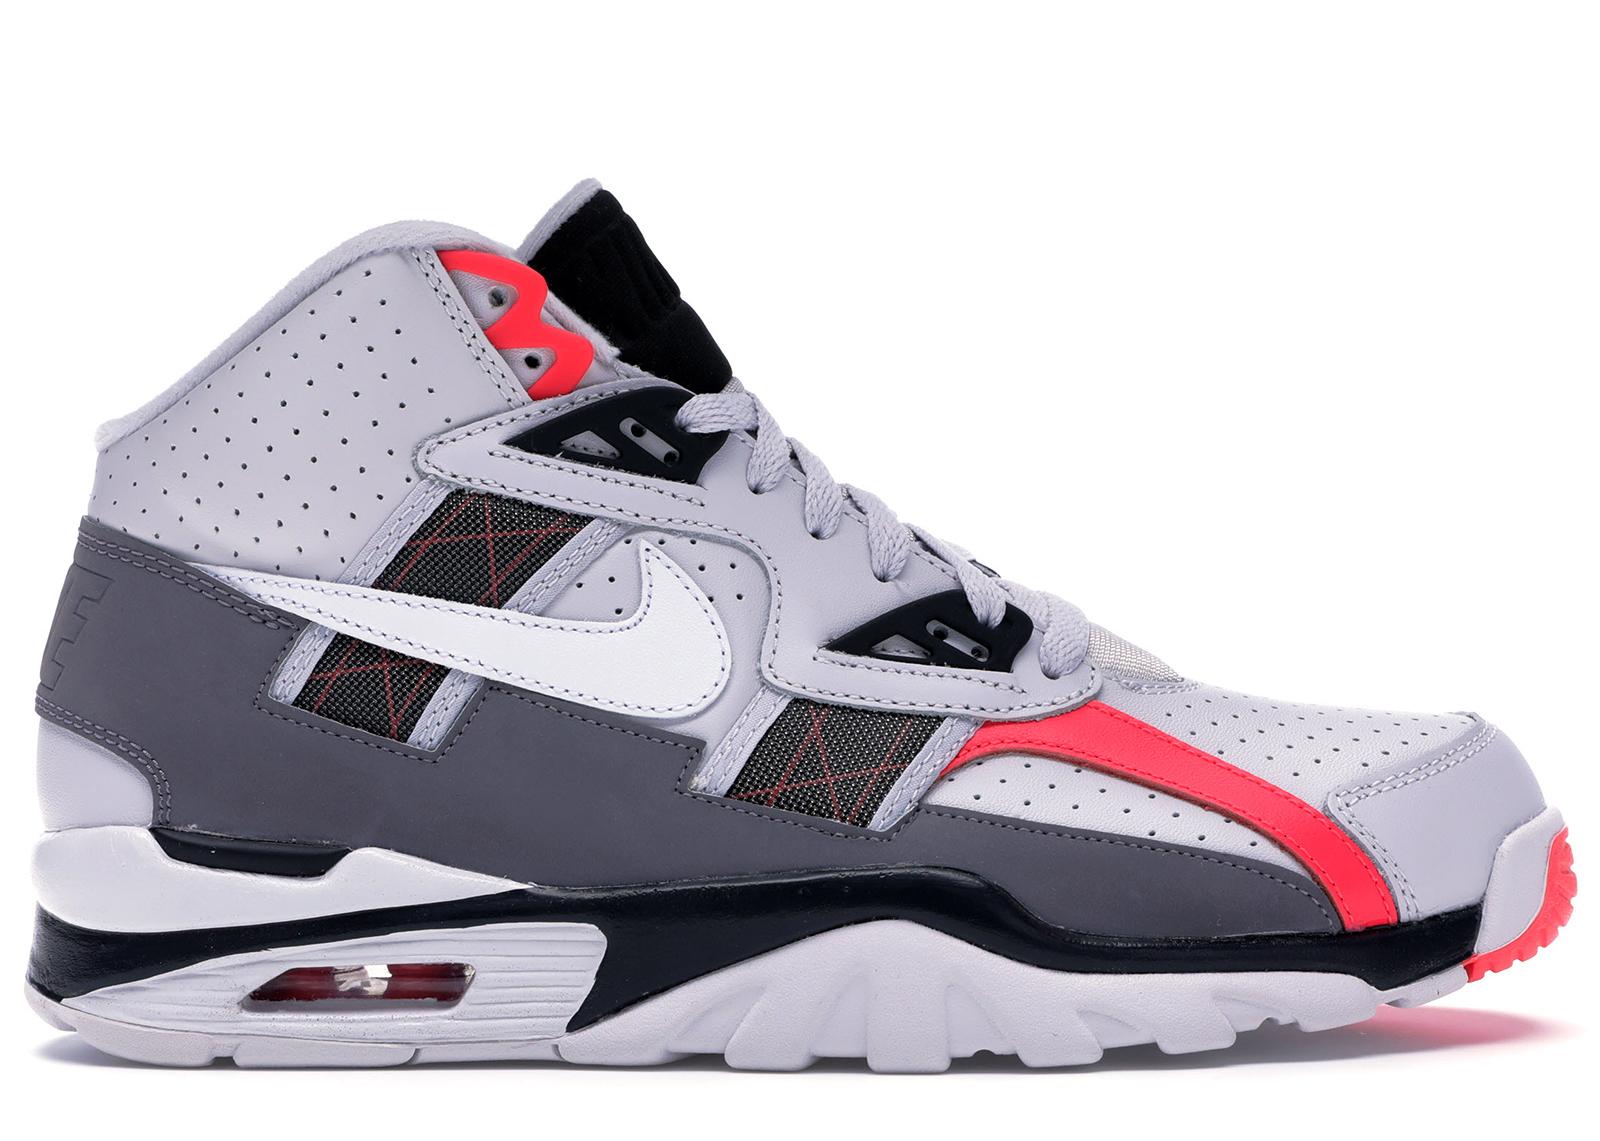 Nike Air Trainer SC High Vast Grey